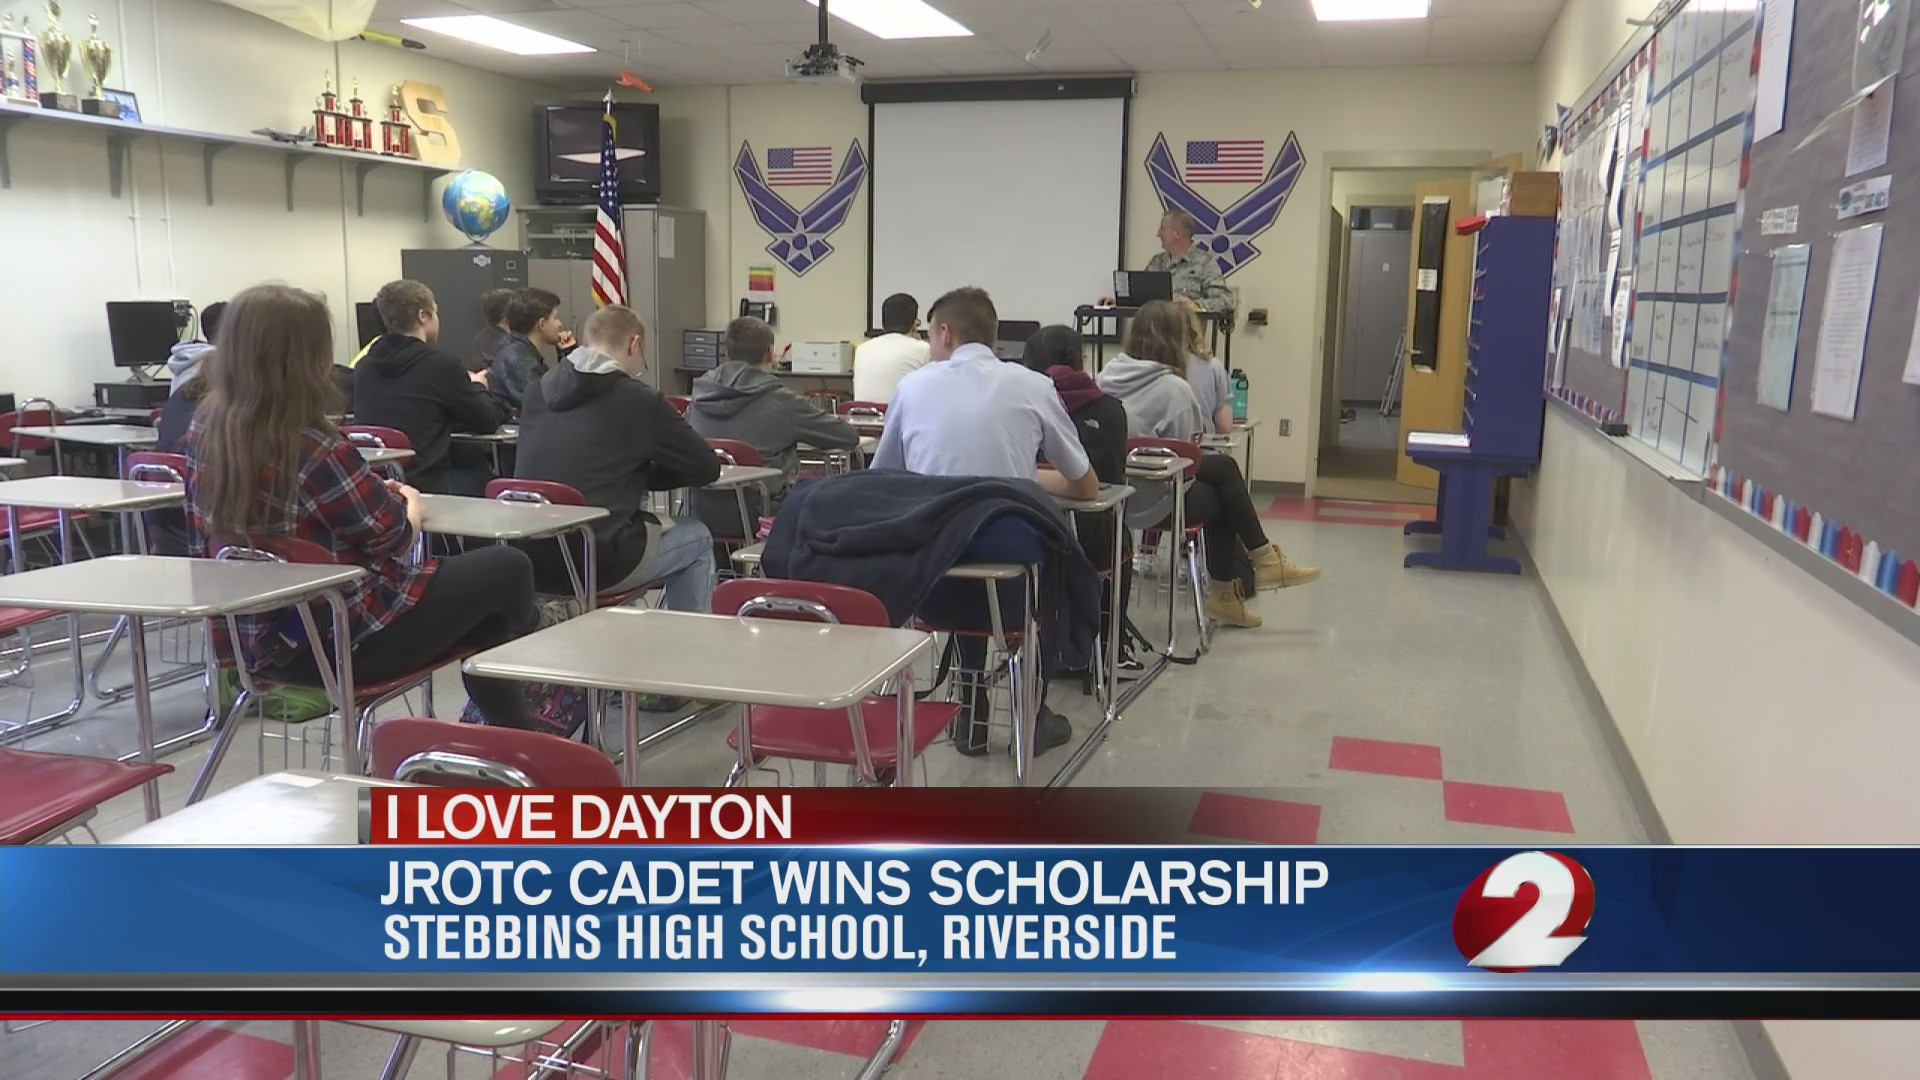 JROTC cadet wins scholarship